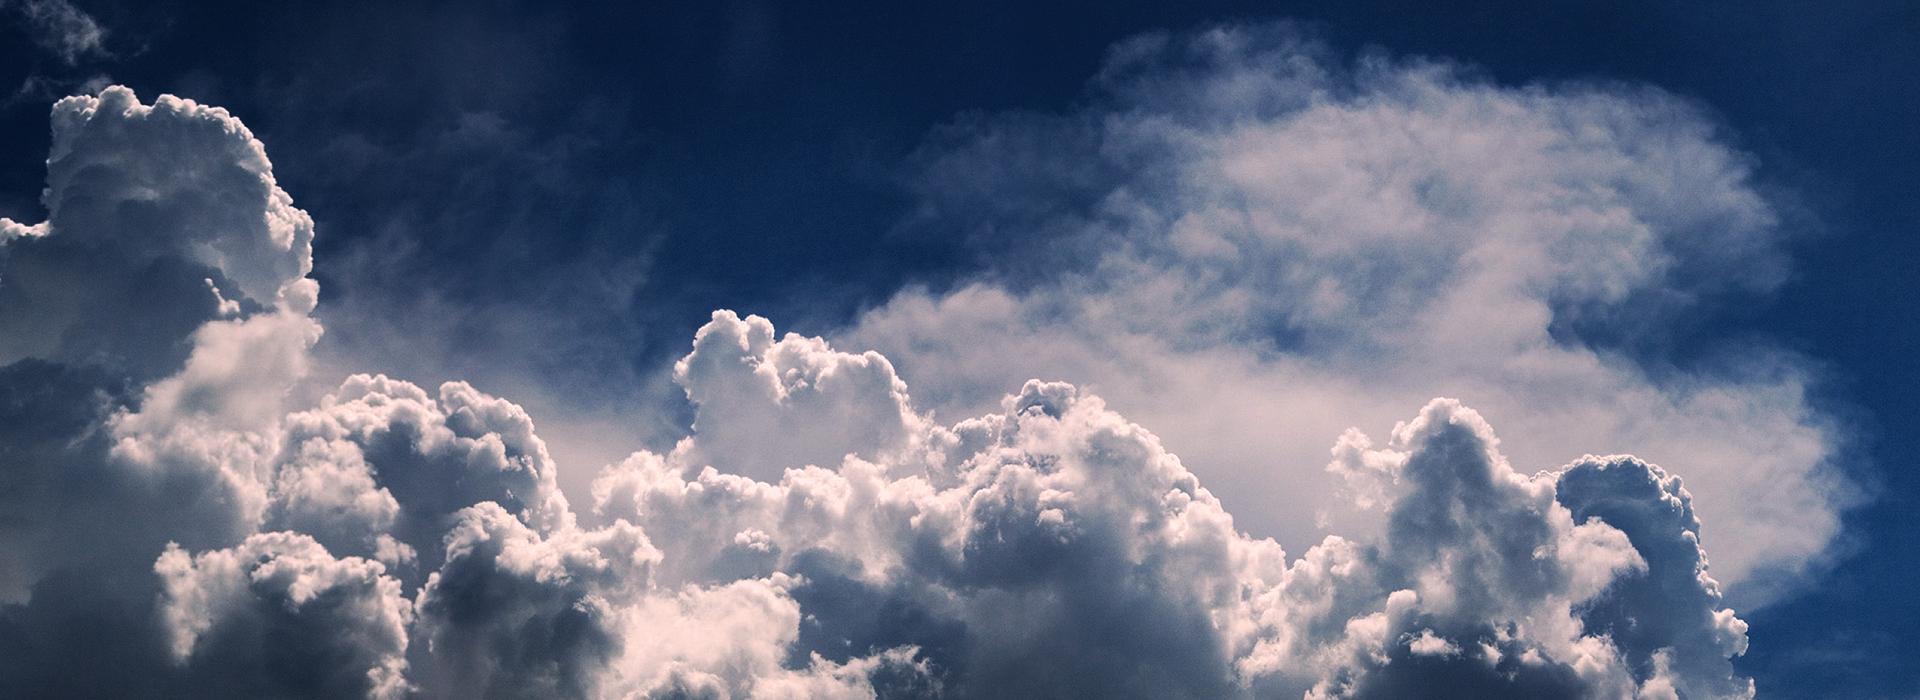 CloudsBG1